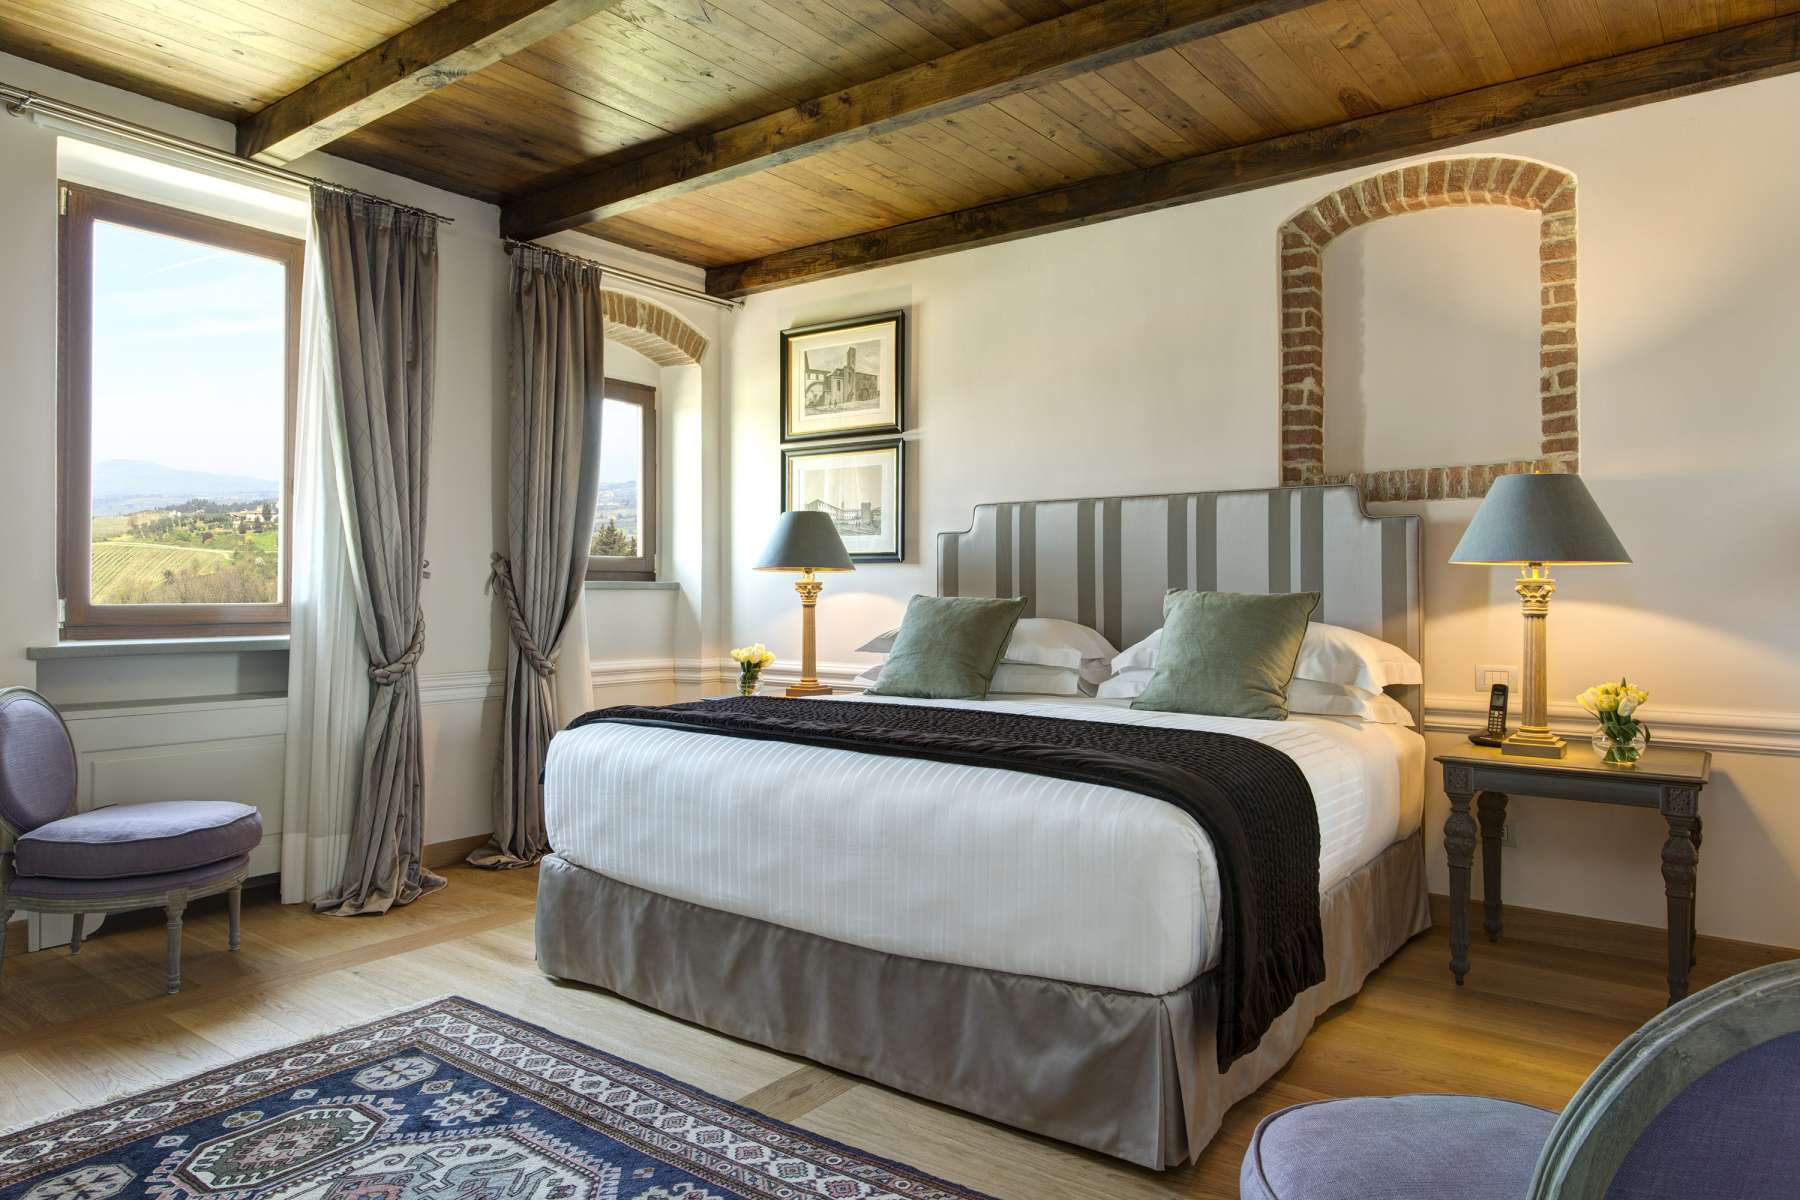 book a room two bedroom suites montespertoli, chianti, florencebook a room two bedroom suites montespertoli, chianti, florence hotel